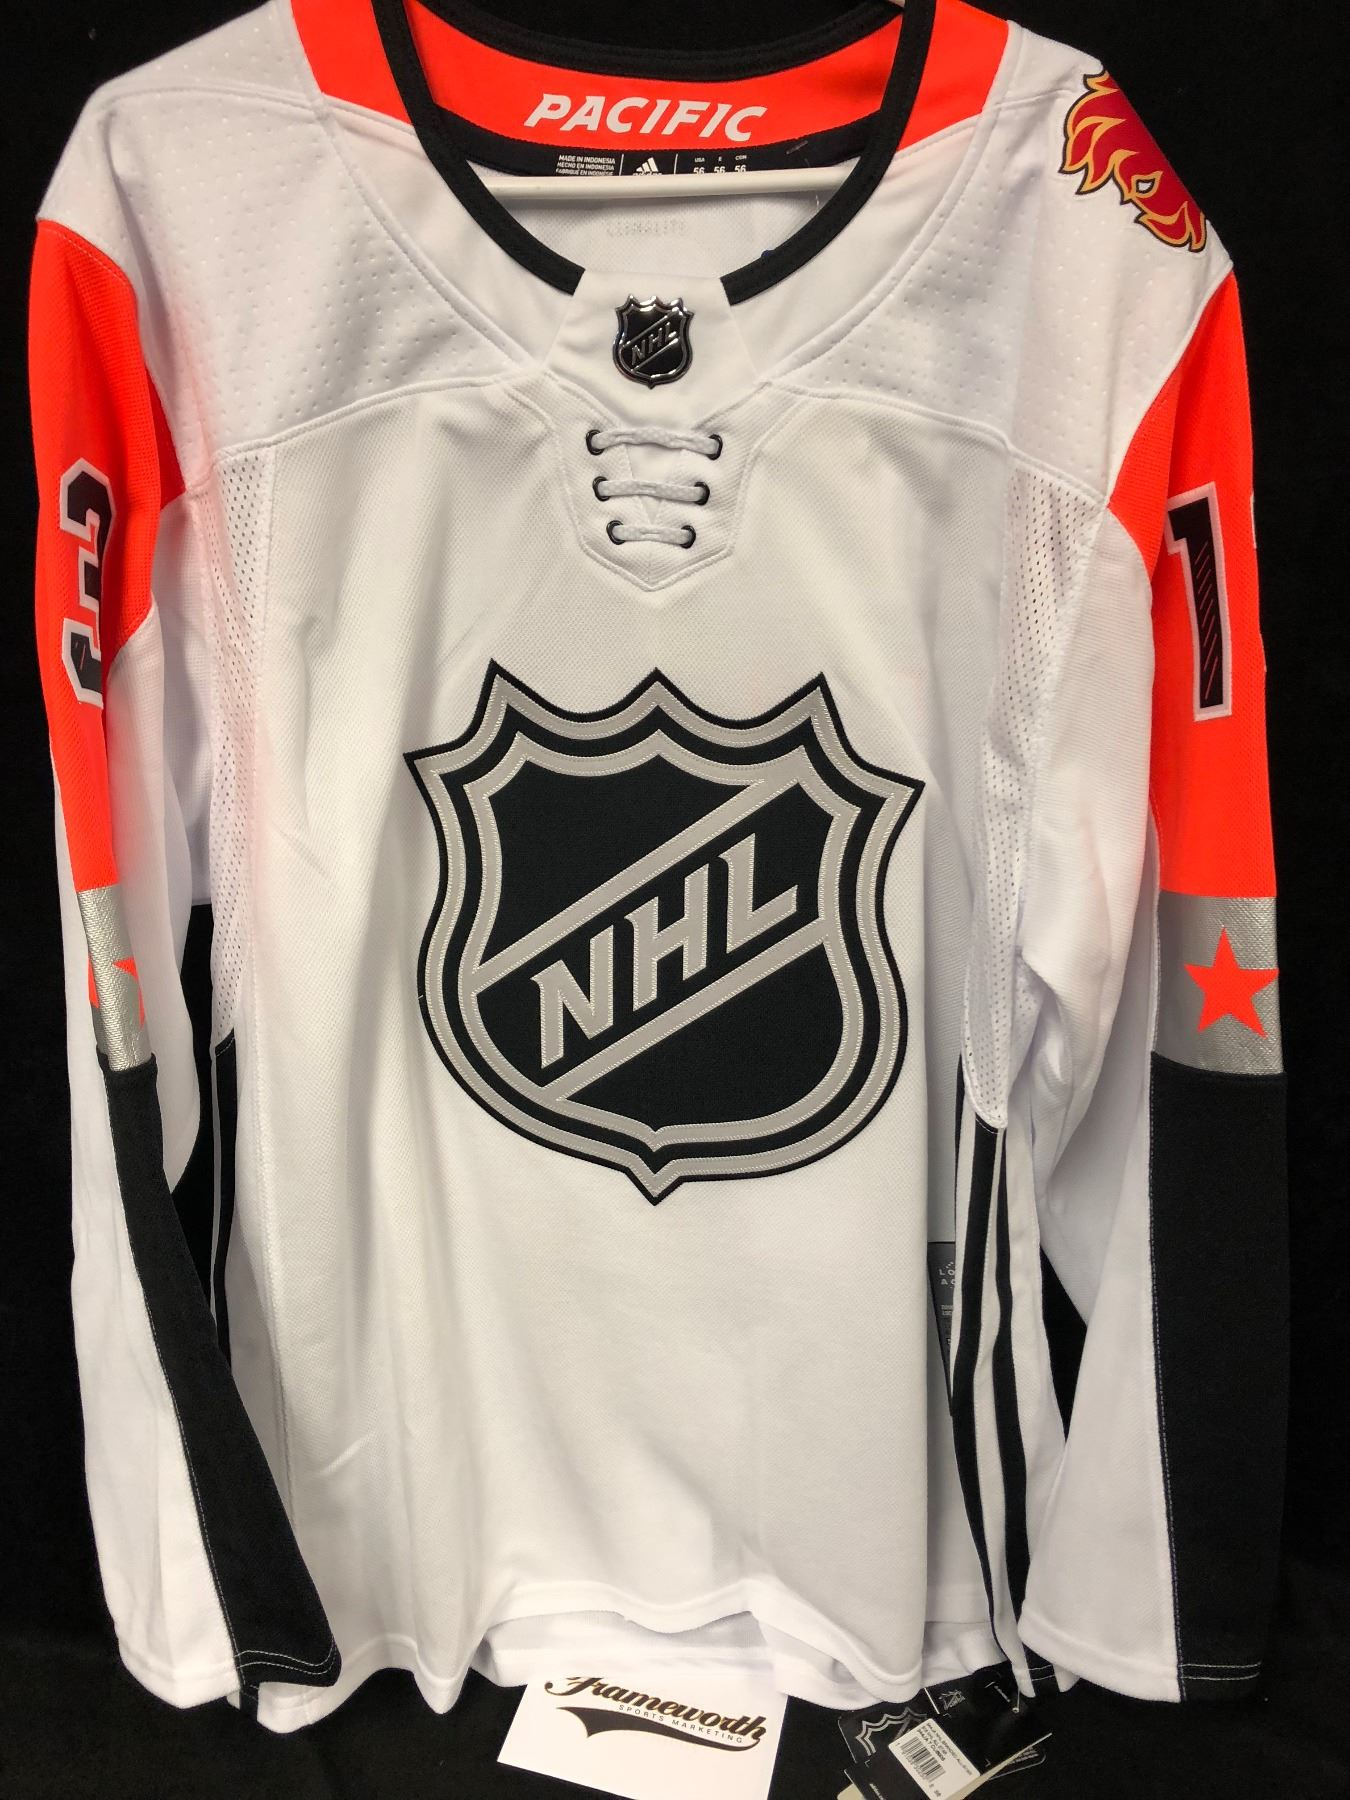 brand new d44a5 d09db JOHNNY GAUDREAU AUTOGRAPHED NHL ALL-STAR JERSEY W/ FRAMEWORTH COA